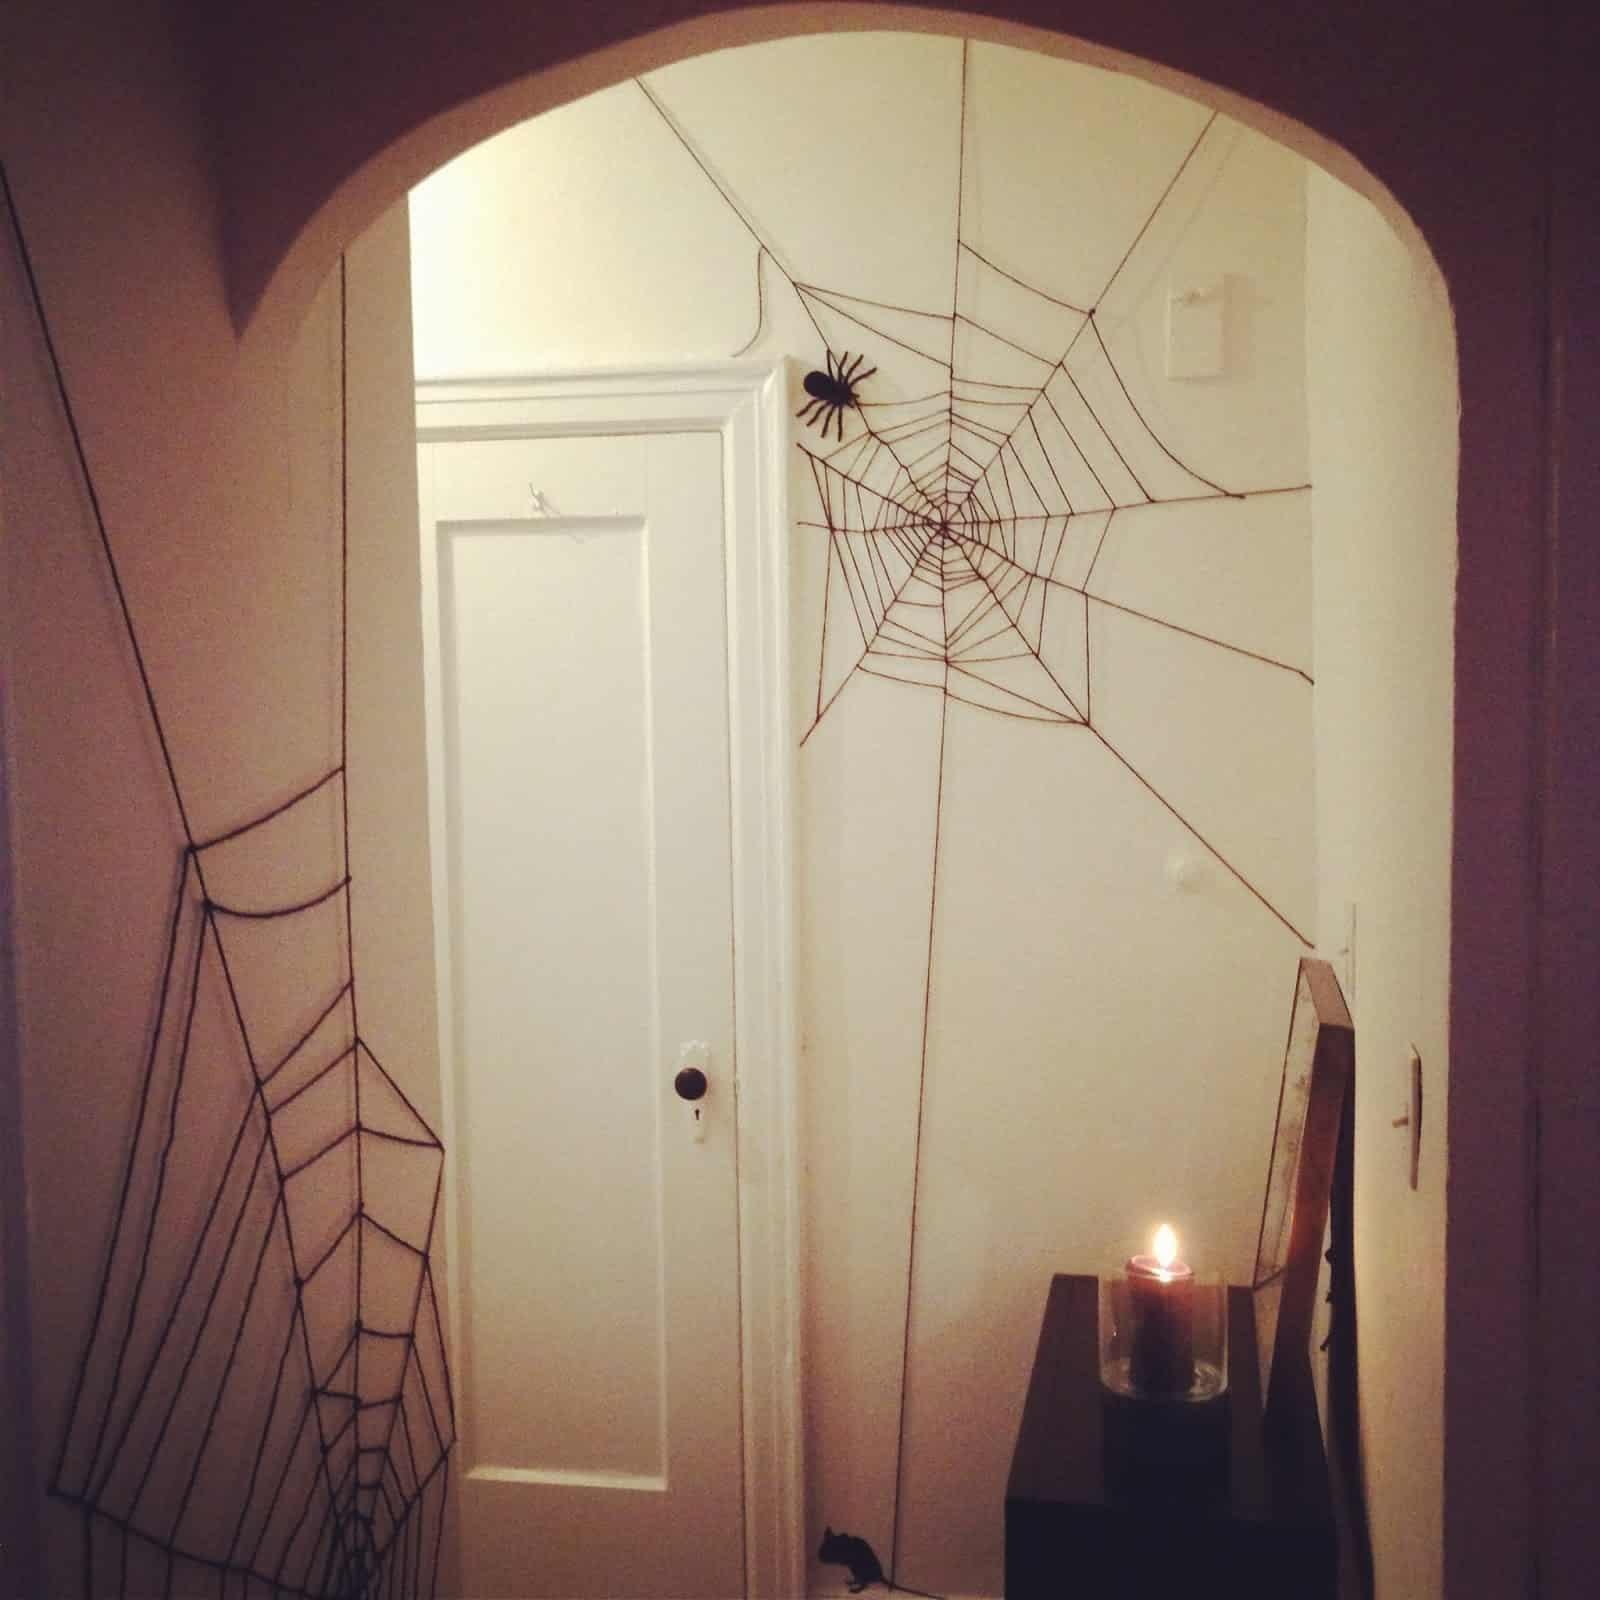 Easy DIY Creepy Halloween Decorations